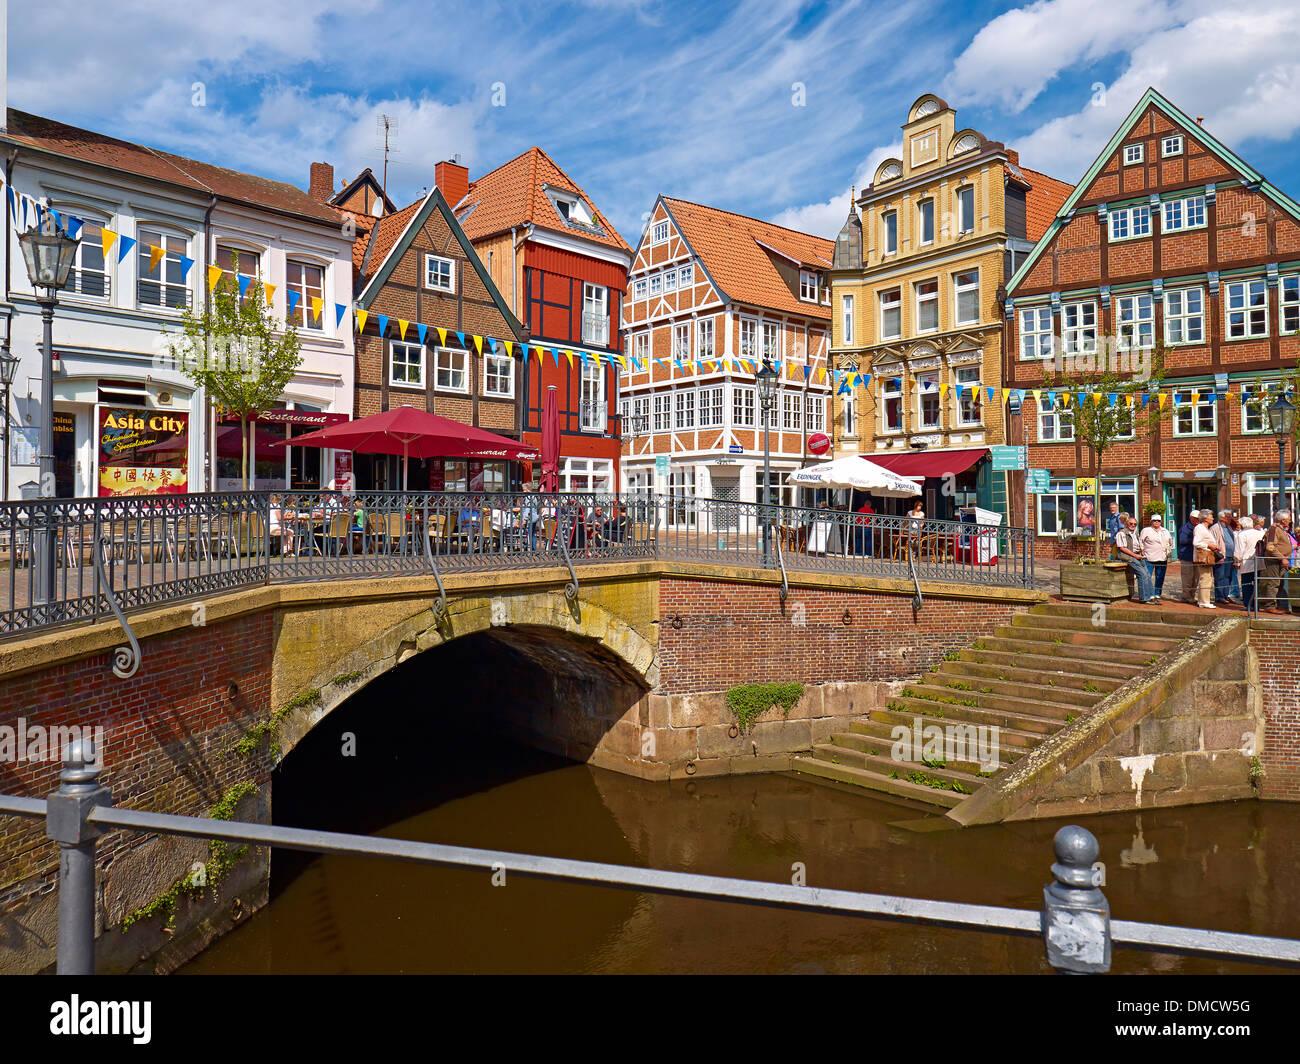 Houses at Hansa port, Hanseatic city of Stade, Lower Saxony, Germany - Stock Image